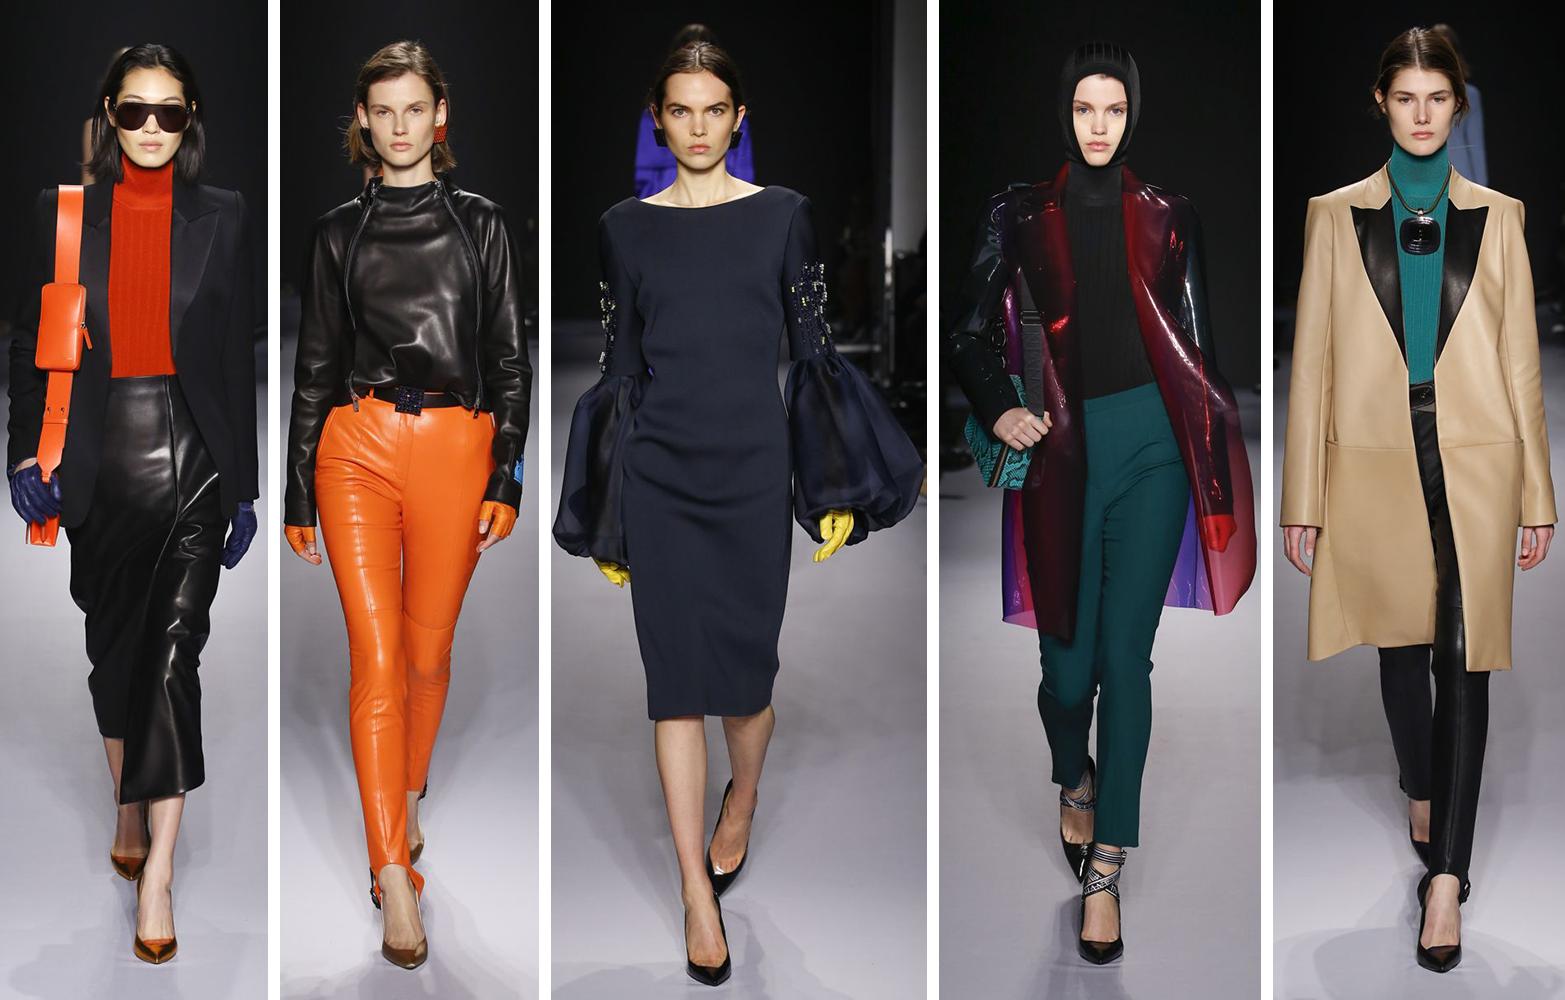 lanvin_parizsi_divathet_oszi-teli_ready-to-wear_kollekcio_2018.png